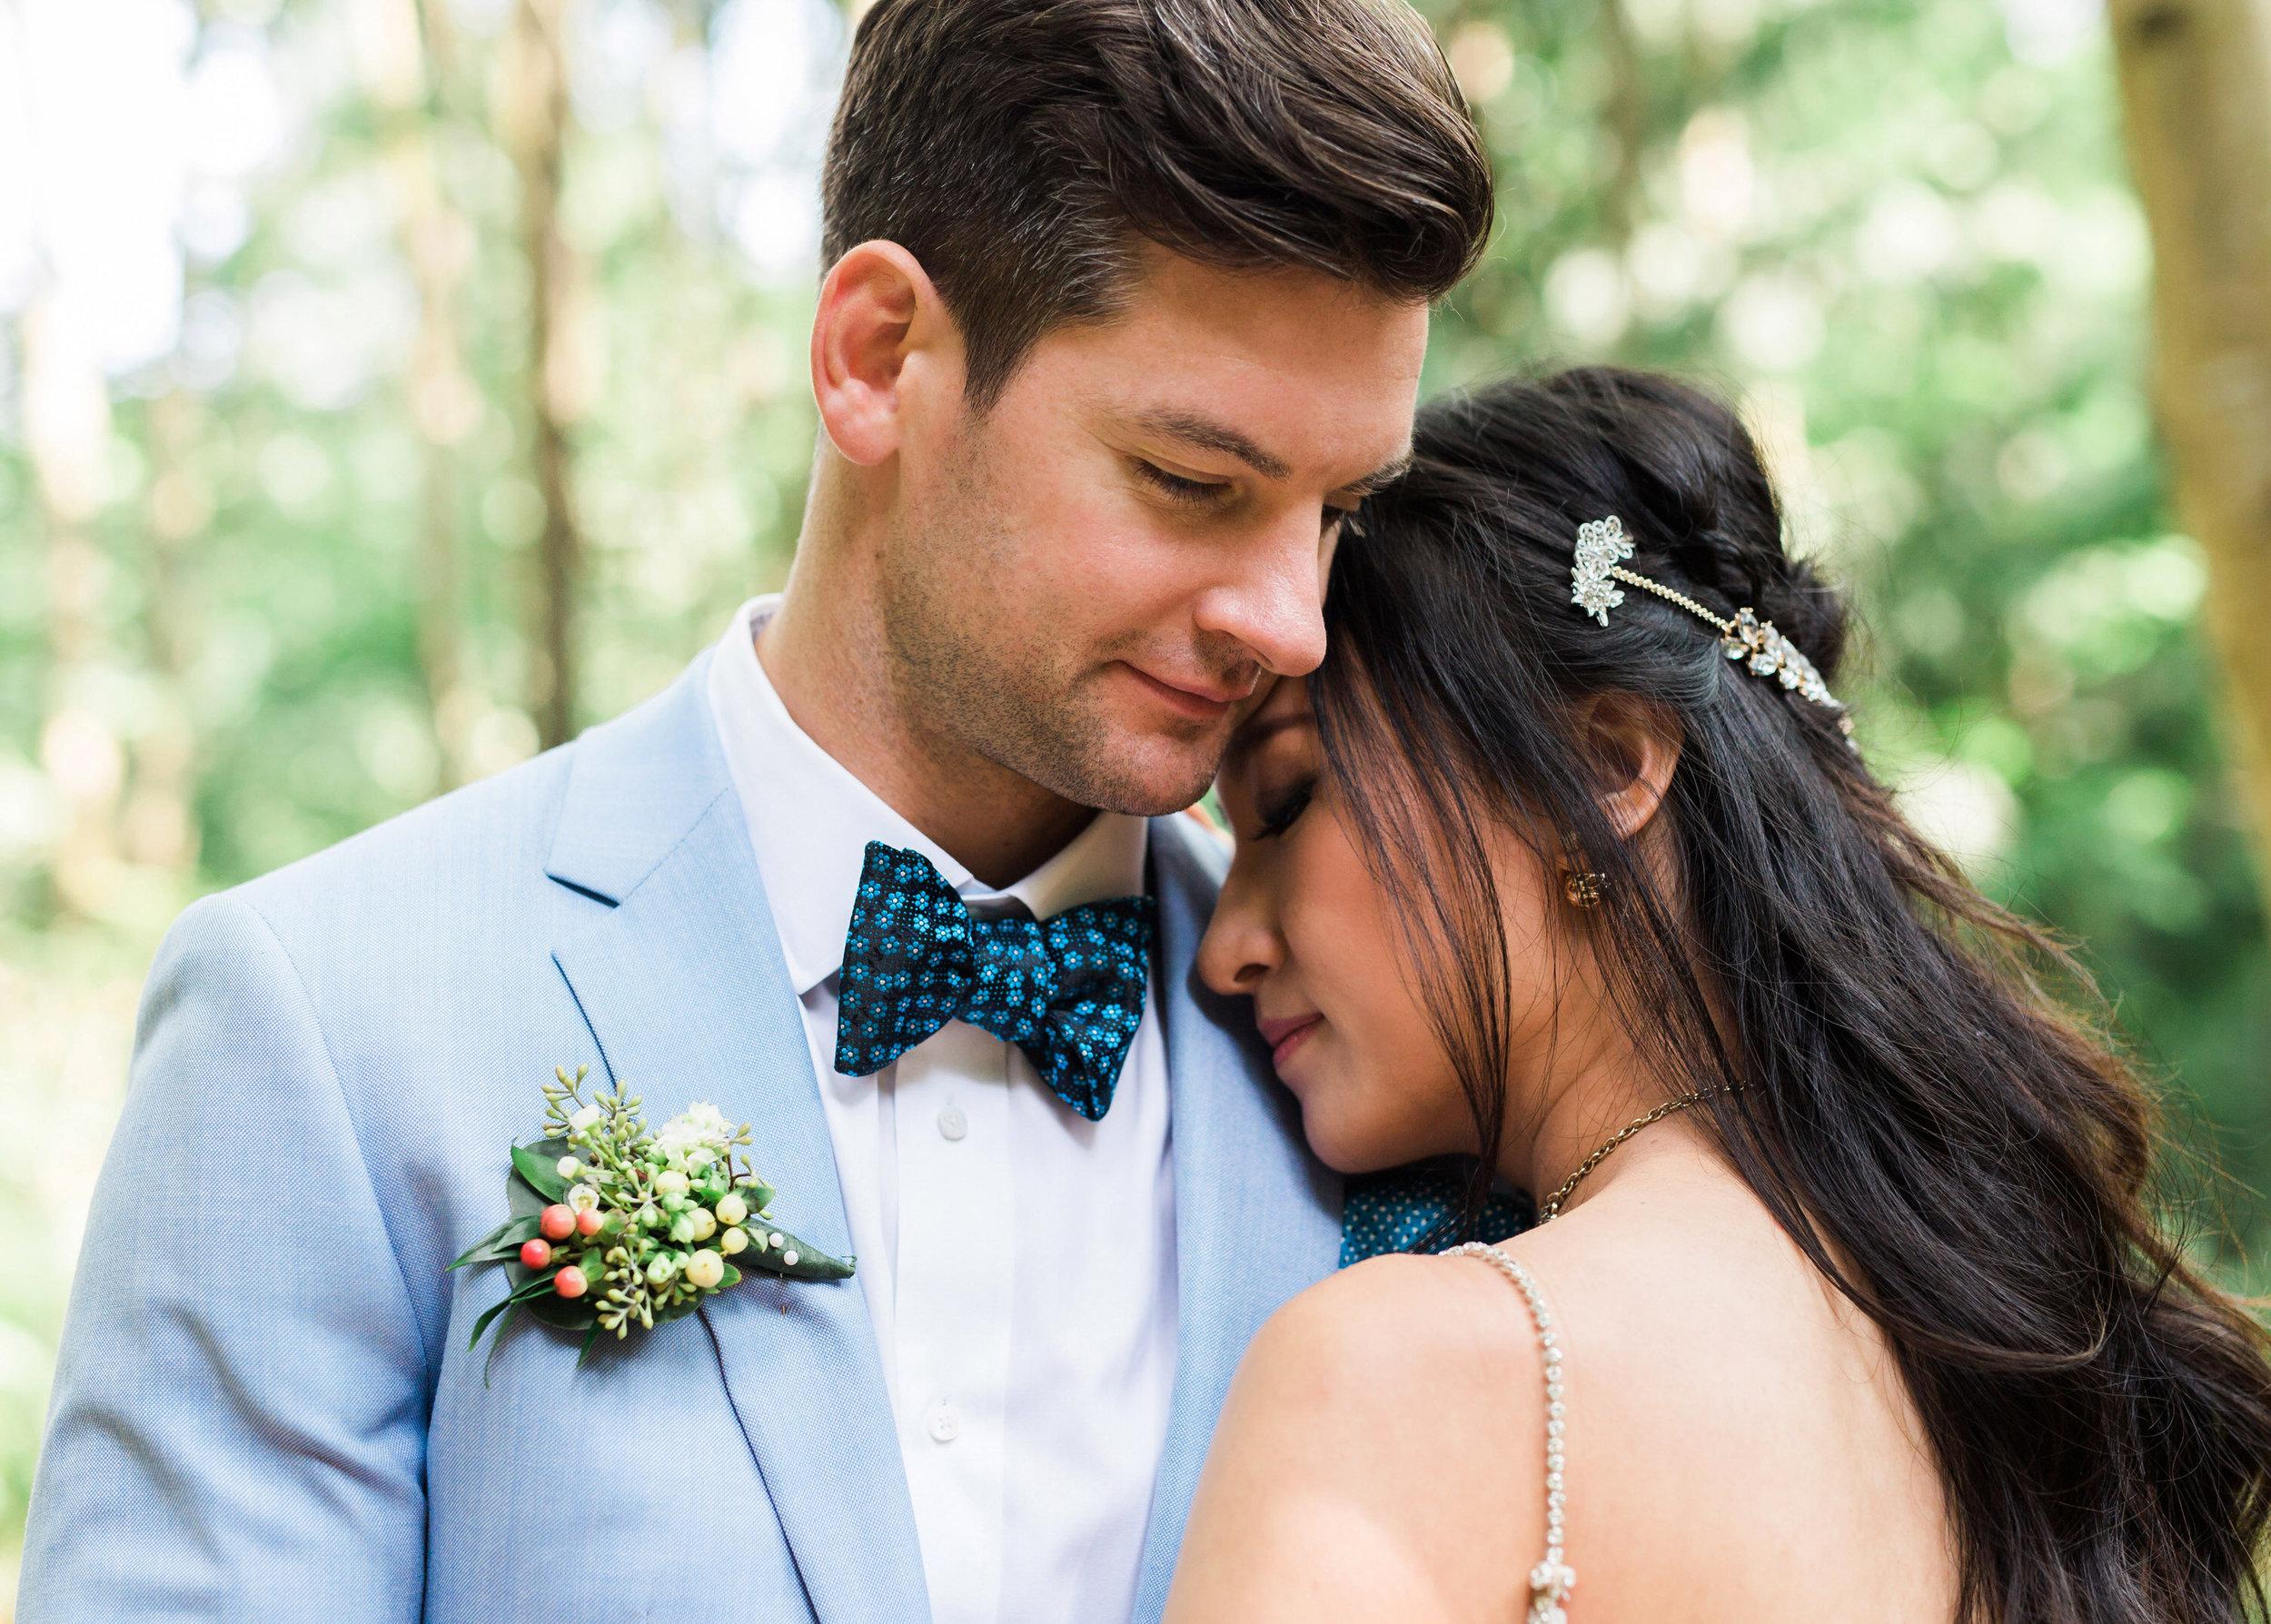 Linwood House Wedding Photos - Roberts Creek Wedding Photos - Vancouver Wedding Photographer & Videographer - Sunshine Coast Wedding Photos - Sunshine Coast Wedding Photographer - Jennifer Picard Photography - IMG_8021.jpg